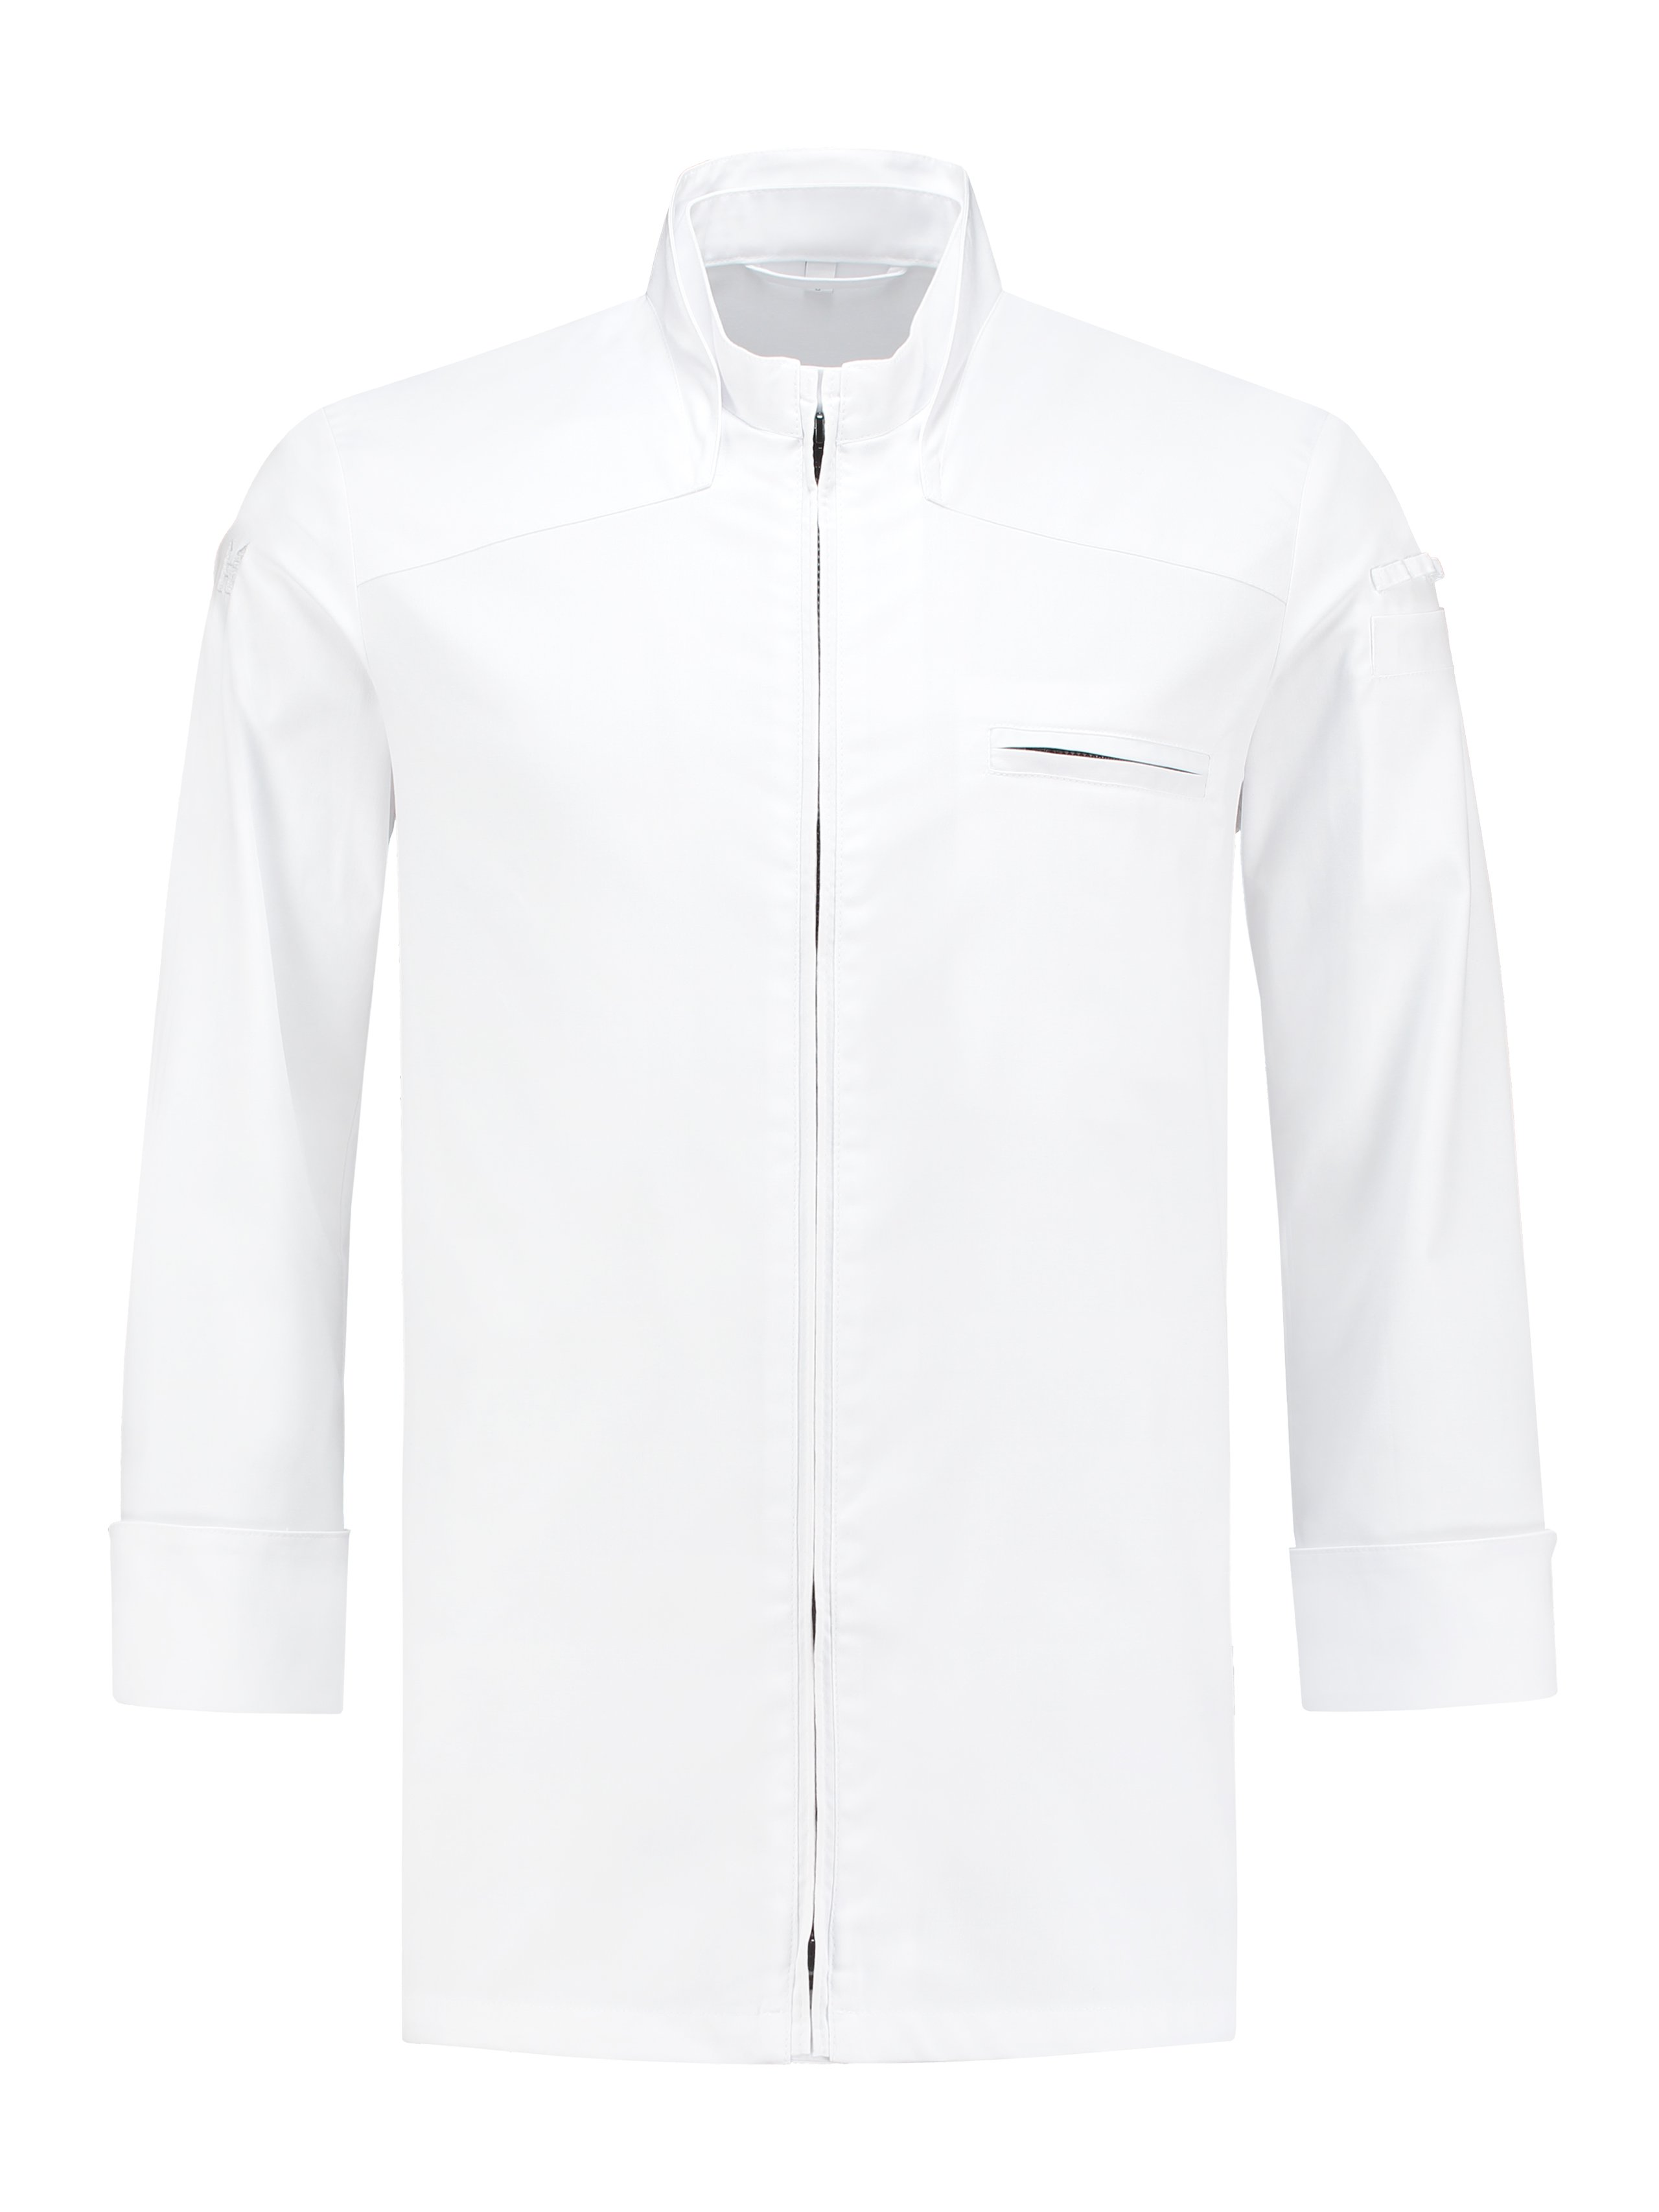 Chef Jacket Nero White